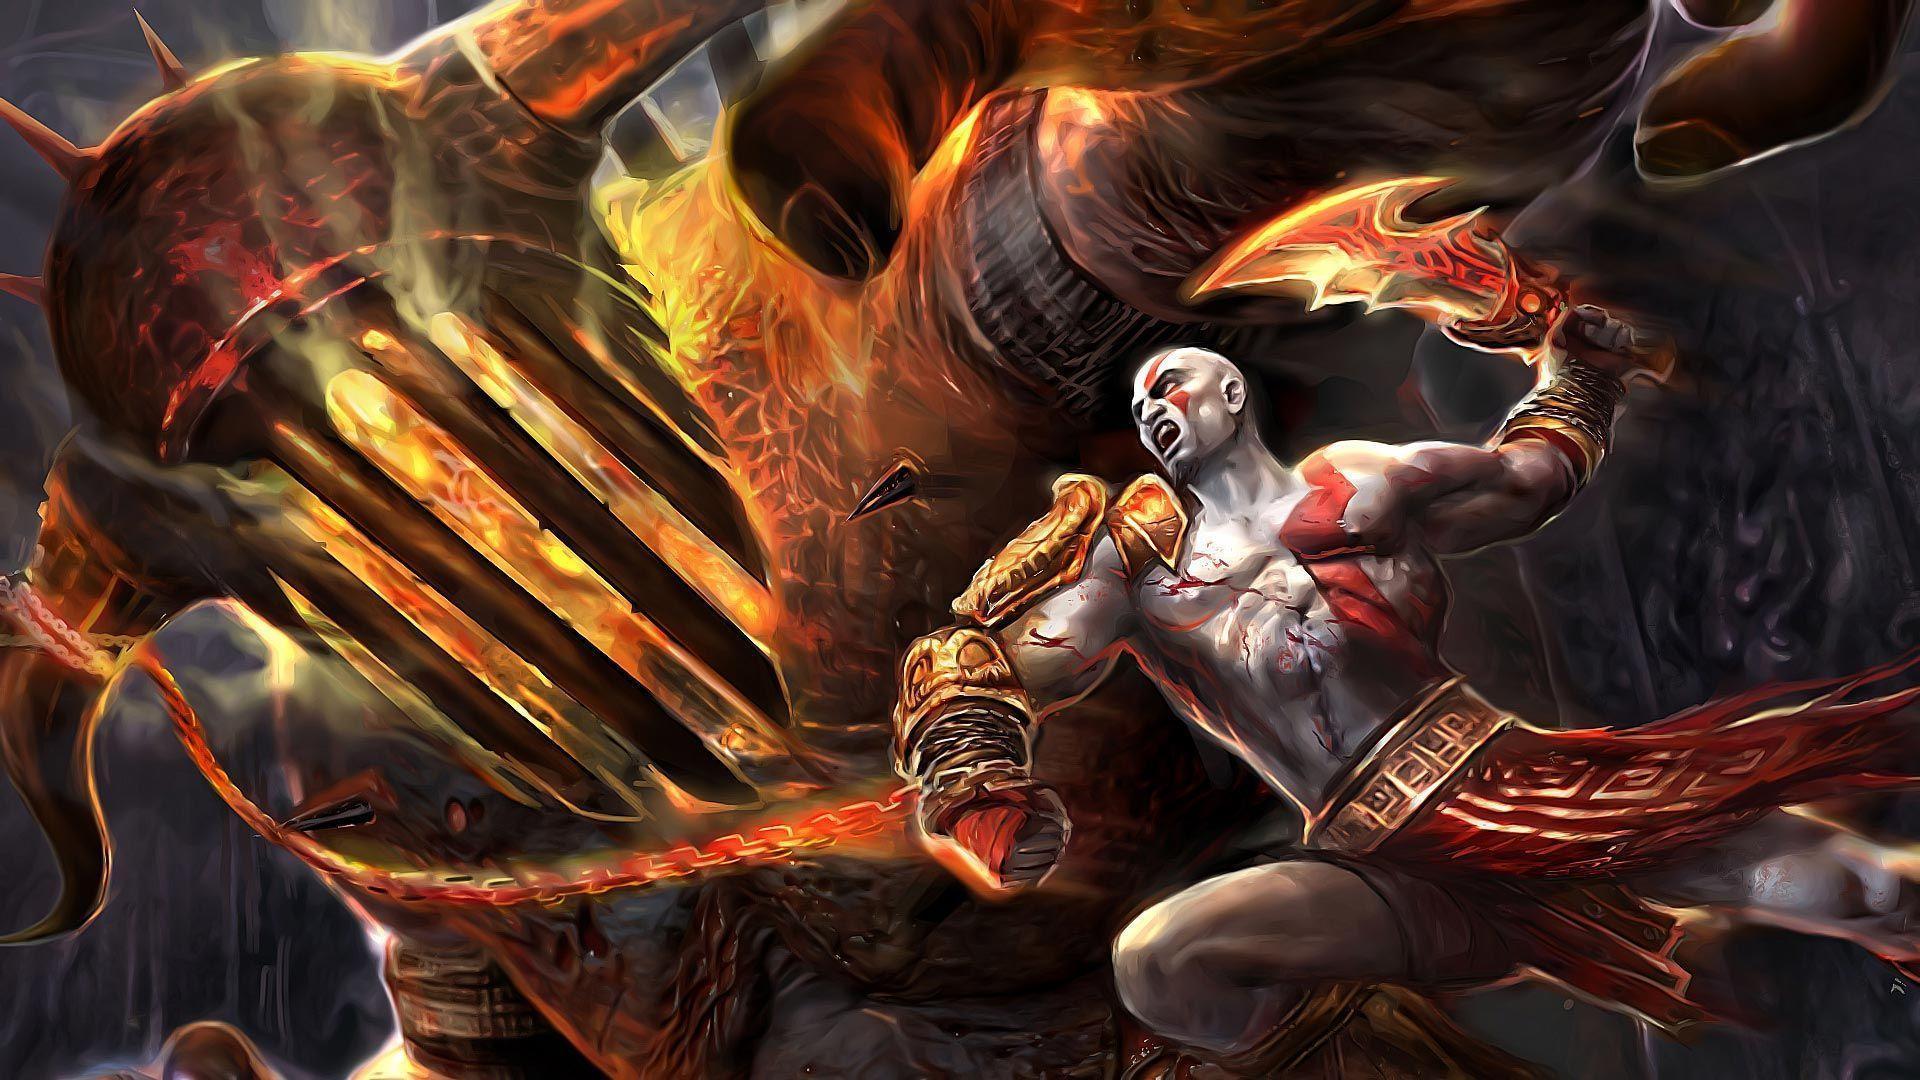 Kratos wallpapers hd wallpaper cave - Wallpaper kratos ...